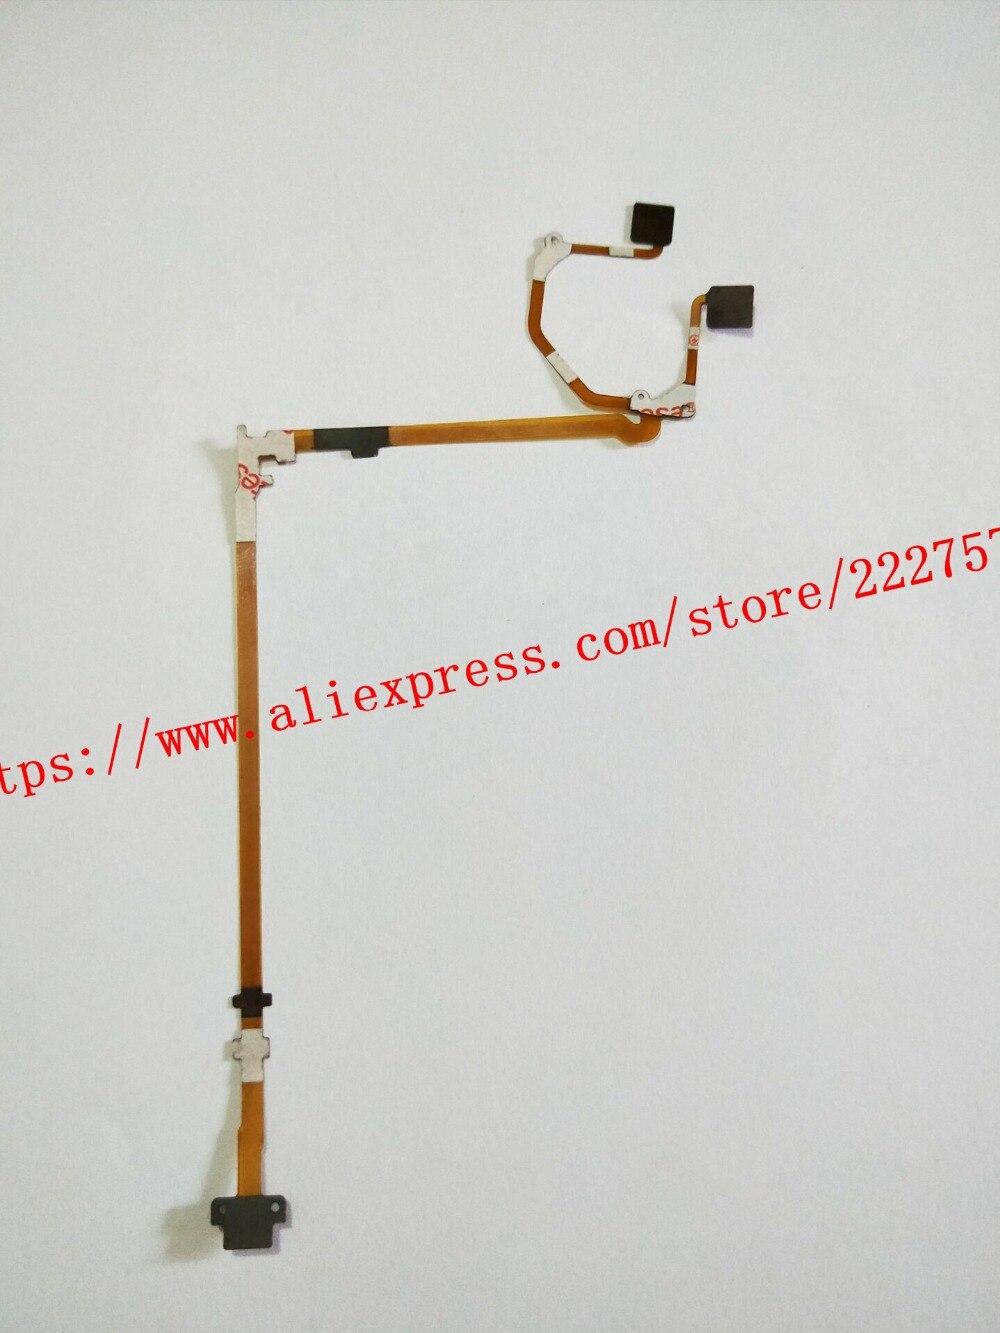 PCS/NEUE Objektiv Anti Shake Flex Kabel Für SONY Cyber-shot DSC-HX300 DSC-HX400 HX300 HX400 Digitalkamera reparatur Teil